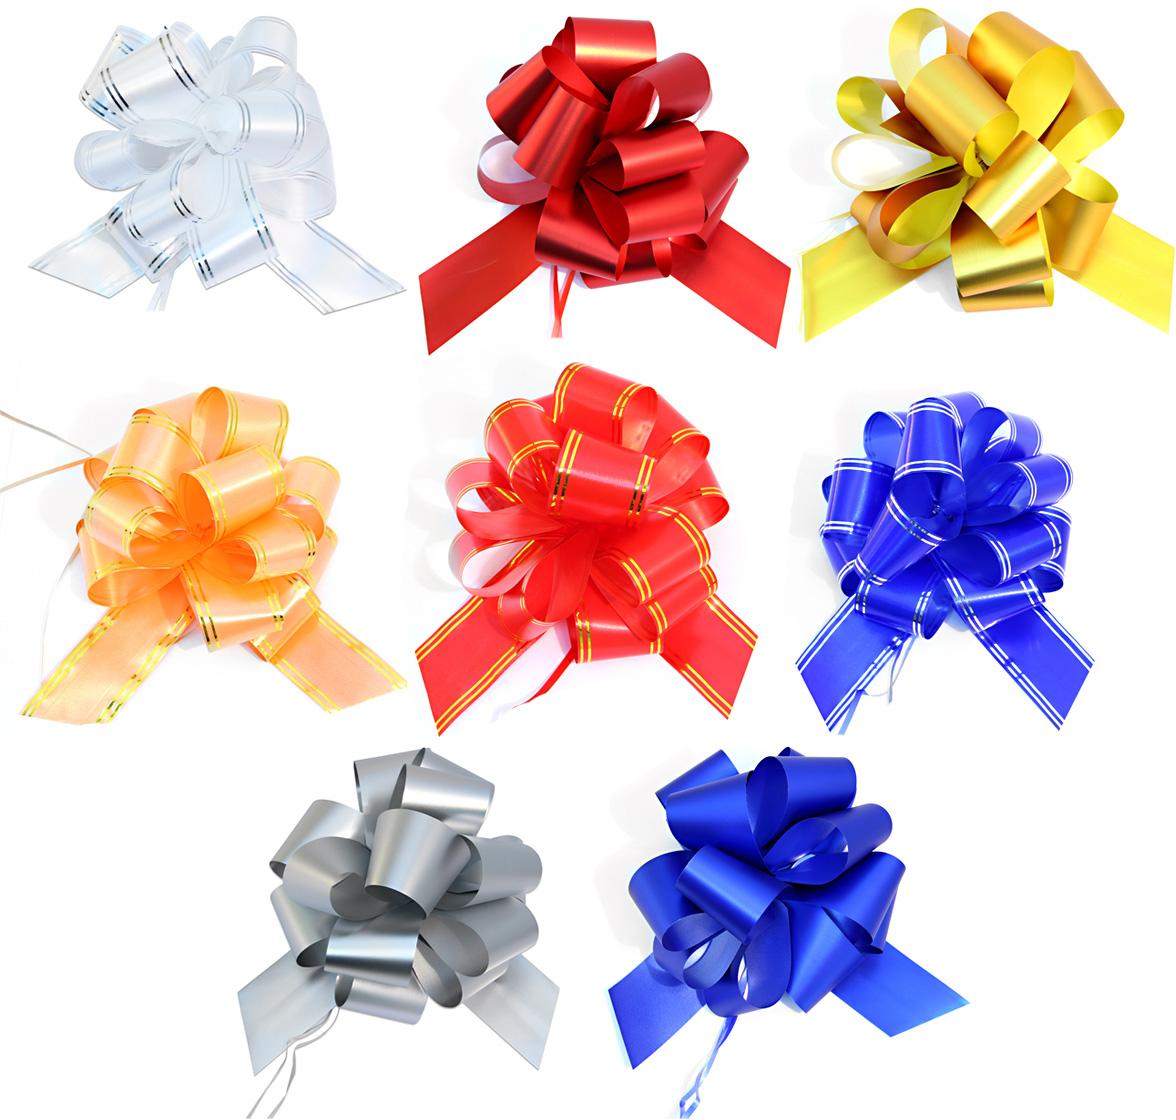 Бант упаковочный Veld-Co Шар, цвет: мультиколор, 5 х 148 см, 10 шт набор декоративных лент veld co парча металл 1 6 см х 3 м 30 шт